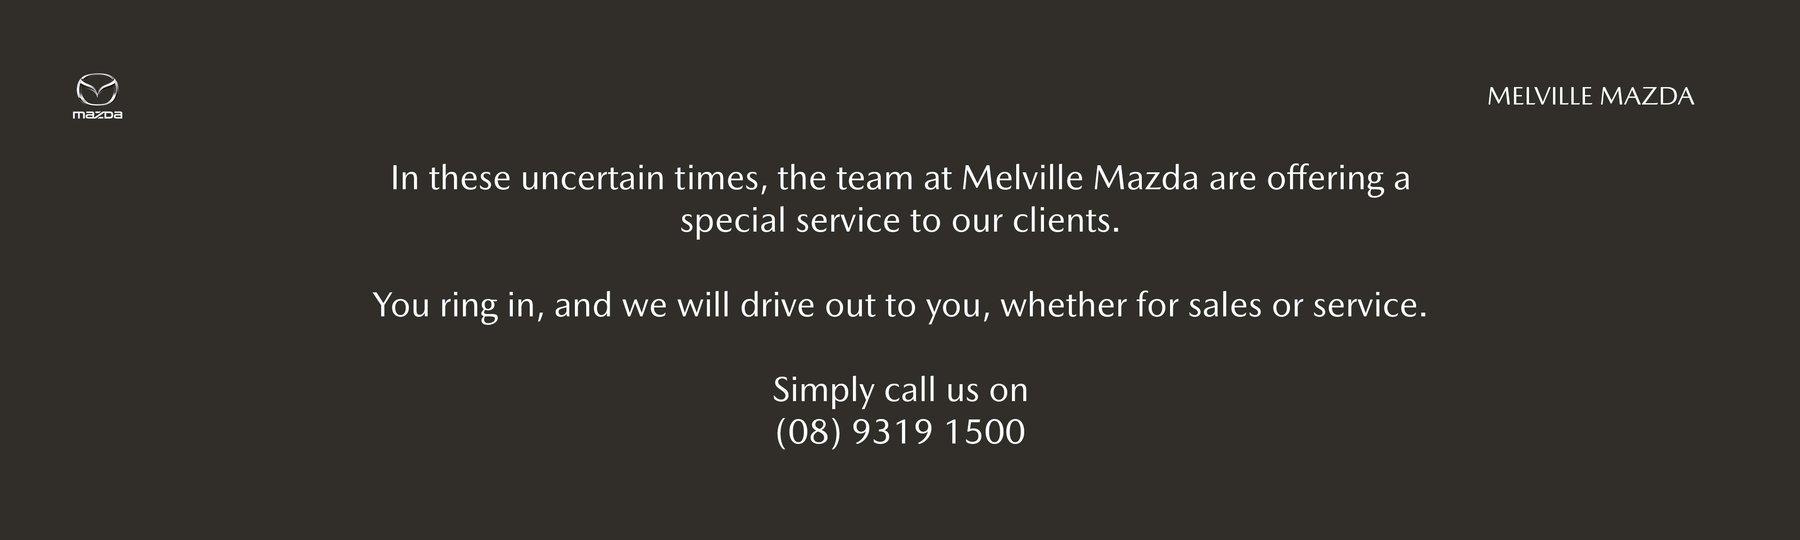 Mazda Fundraiser